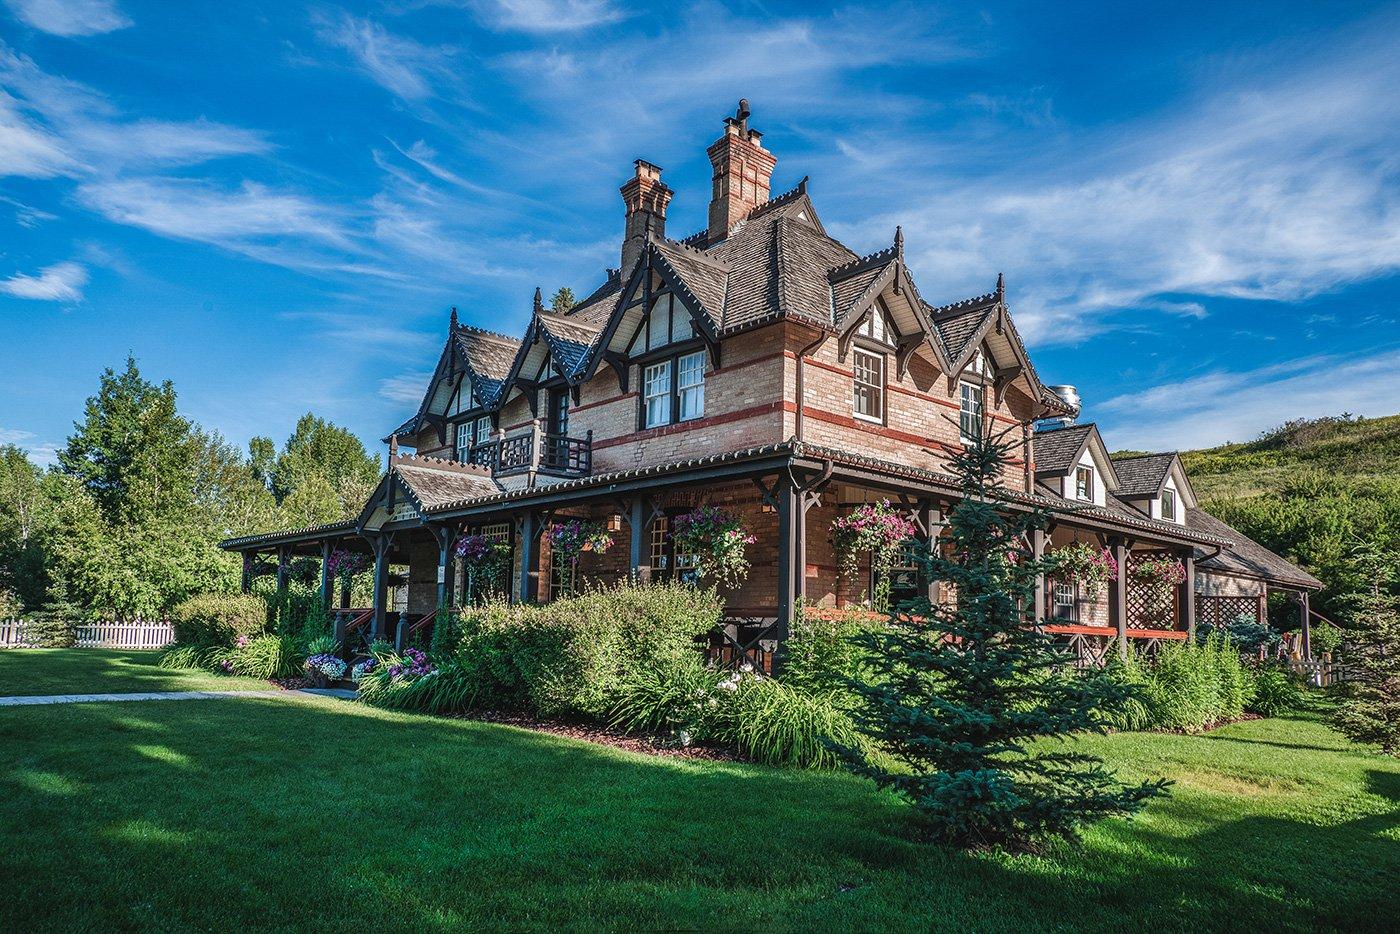 The best restaurant in Calgary according to TripAdvisor